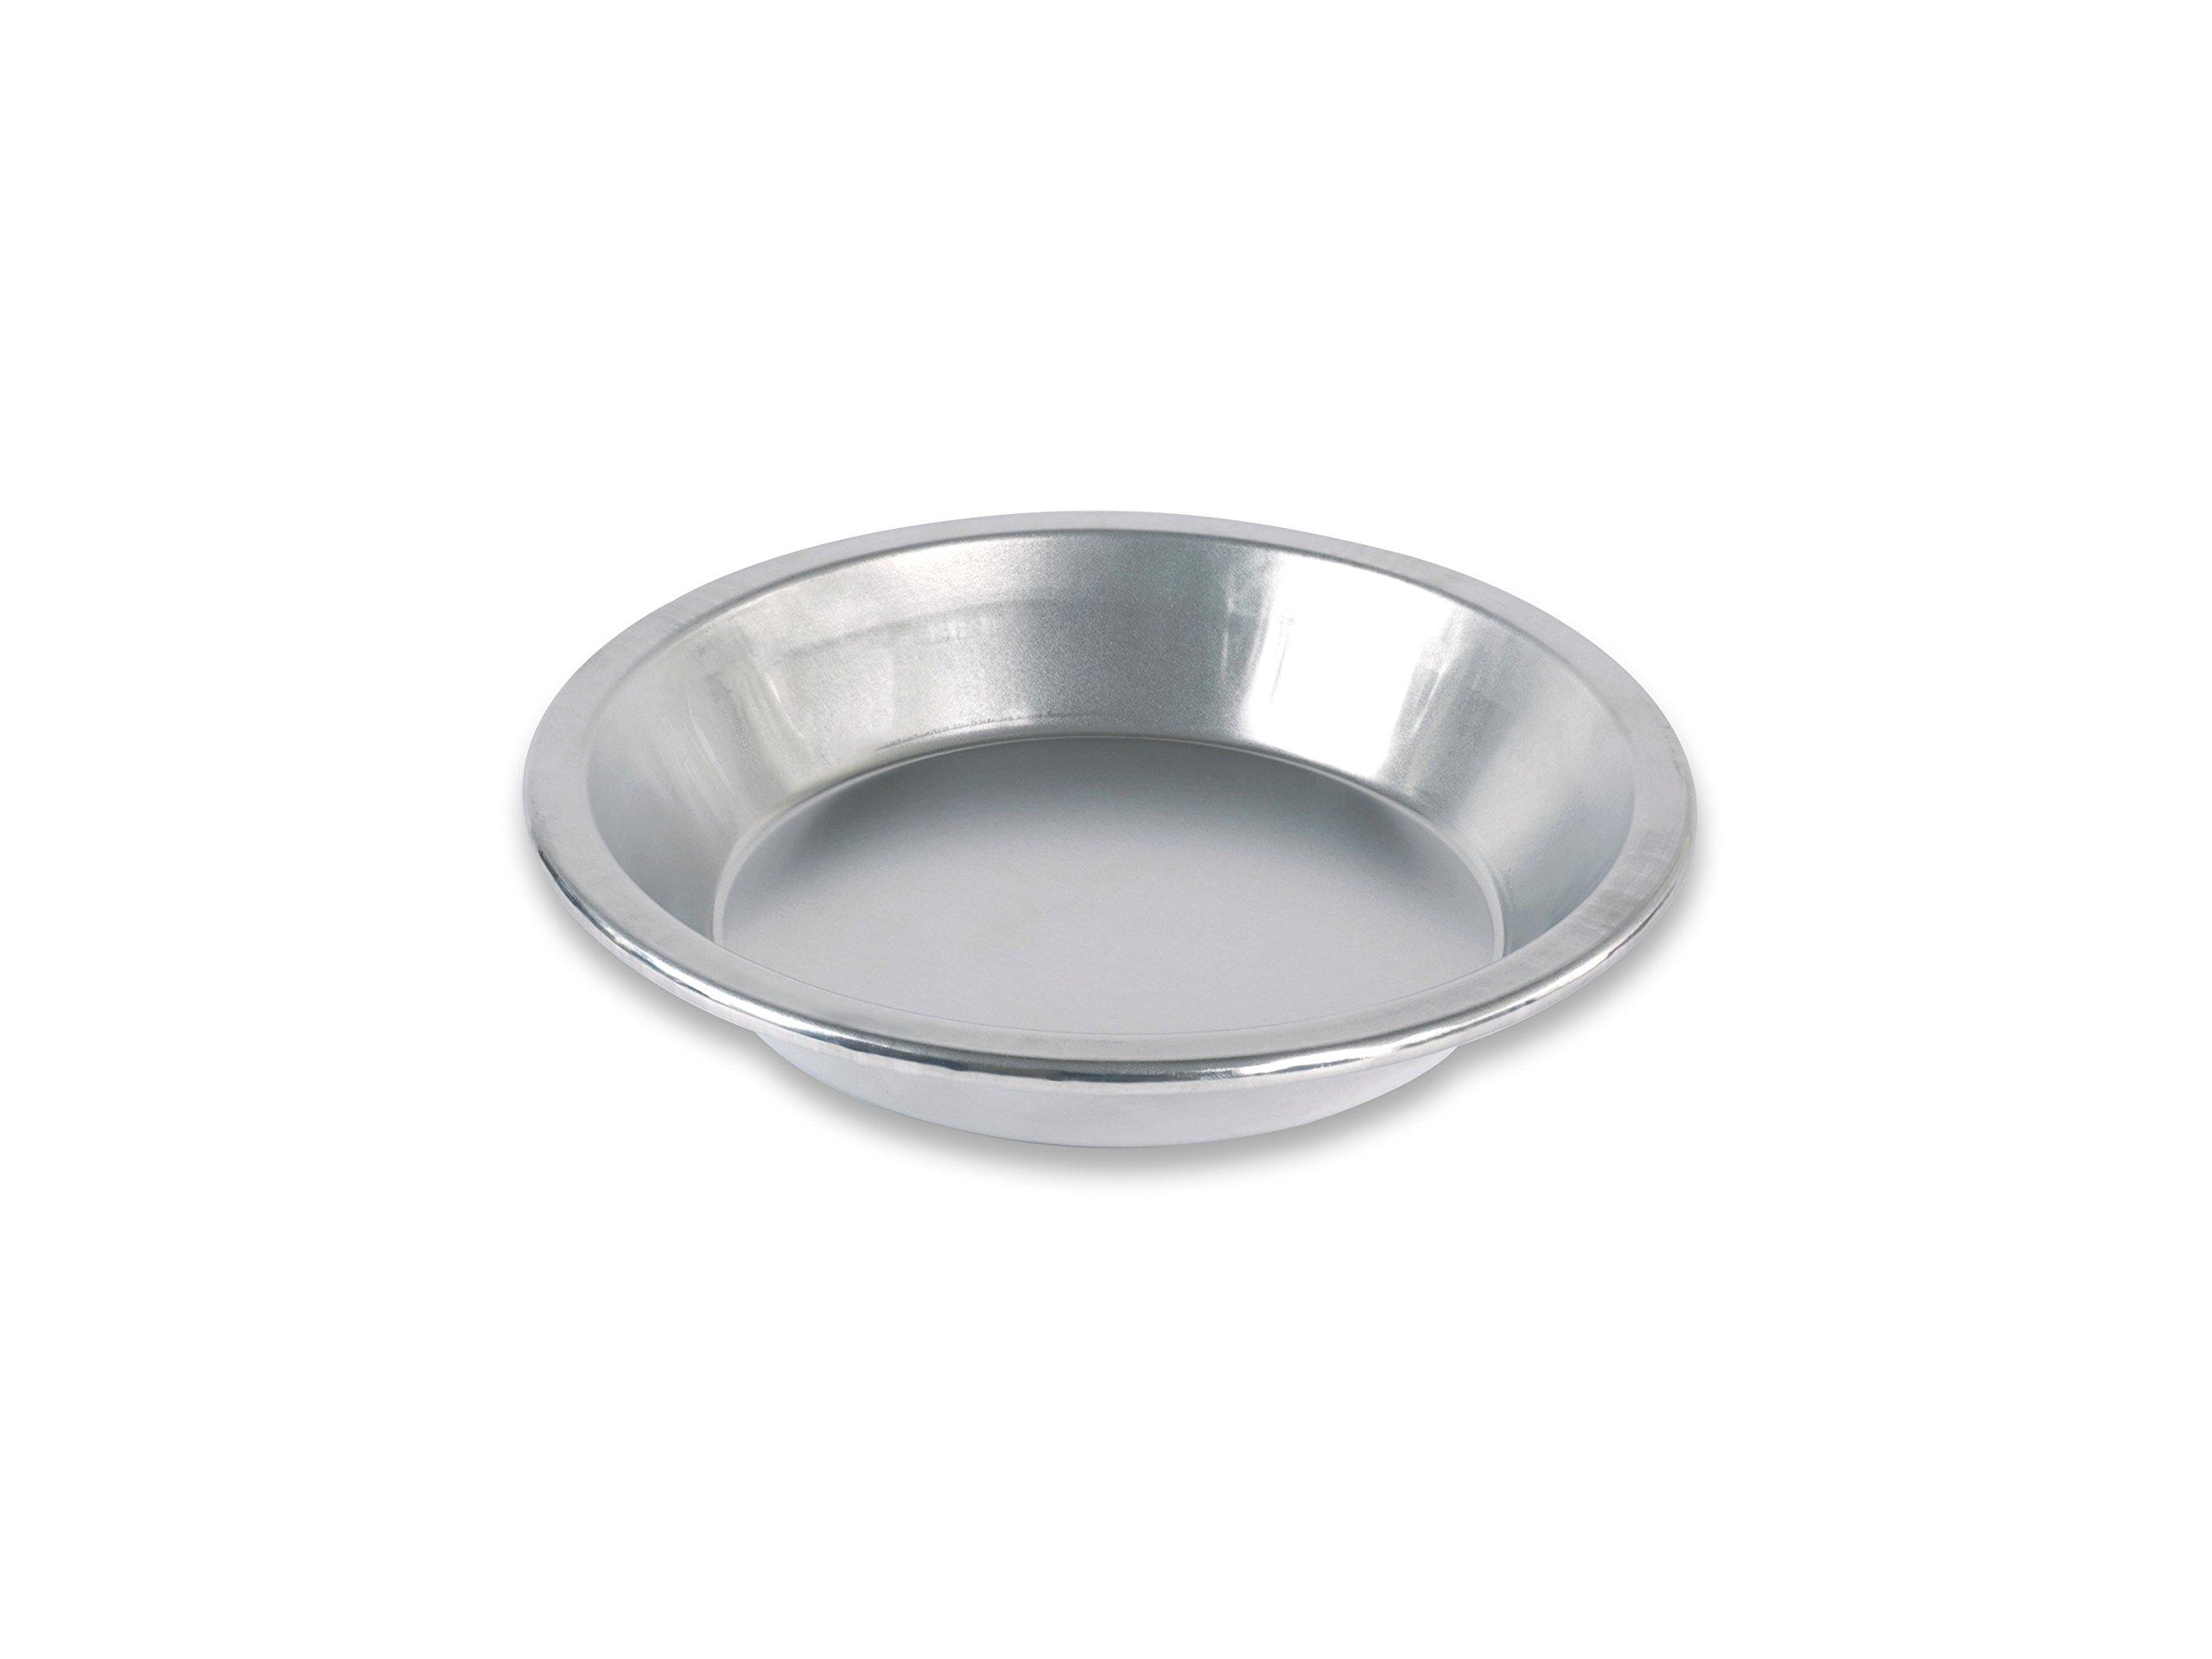 USA Pan Bare Aluminum Bakeware 1100PE-BB 9'' Pie Baking Pan Warp-Resistant, Rust-Proof Bakeware